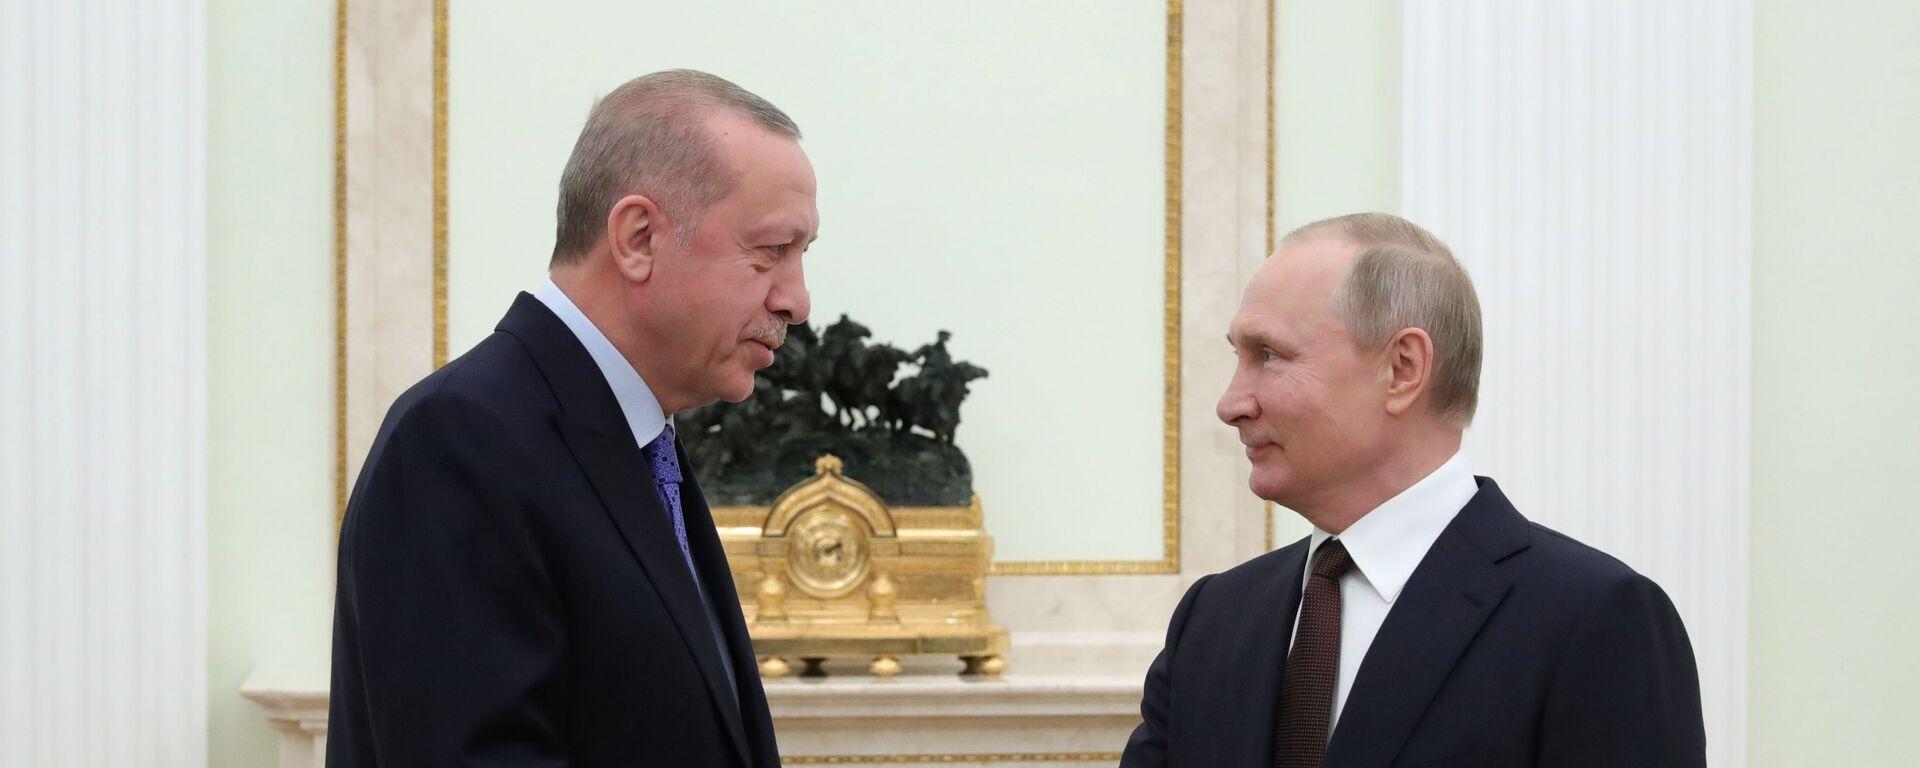 Recep Tayyip Erdogan e Vladimir Putin - Sputnik Italia, 1920, 28.09.2021